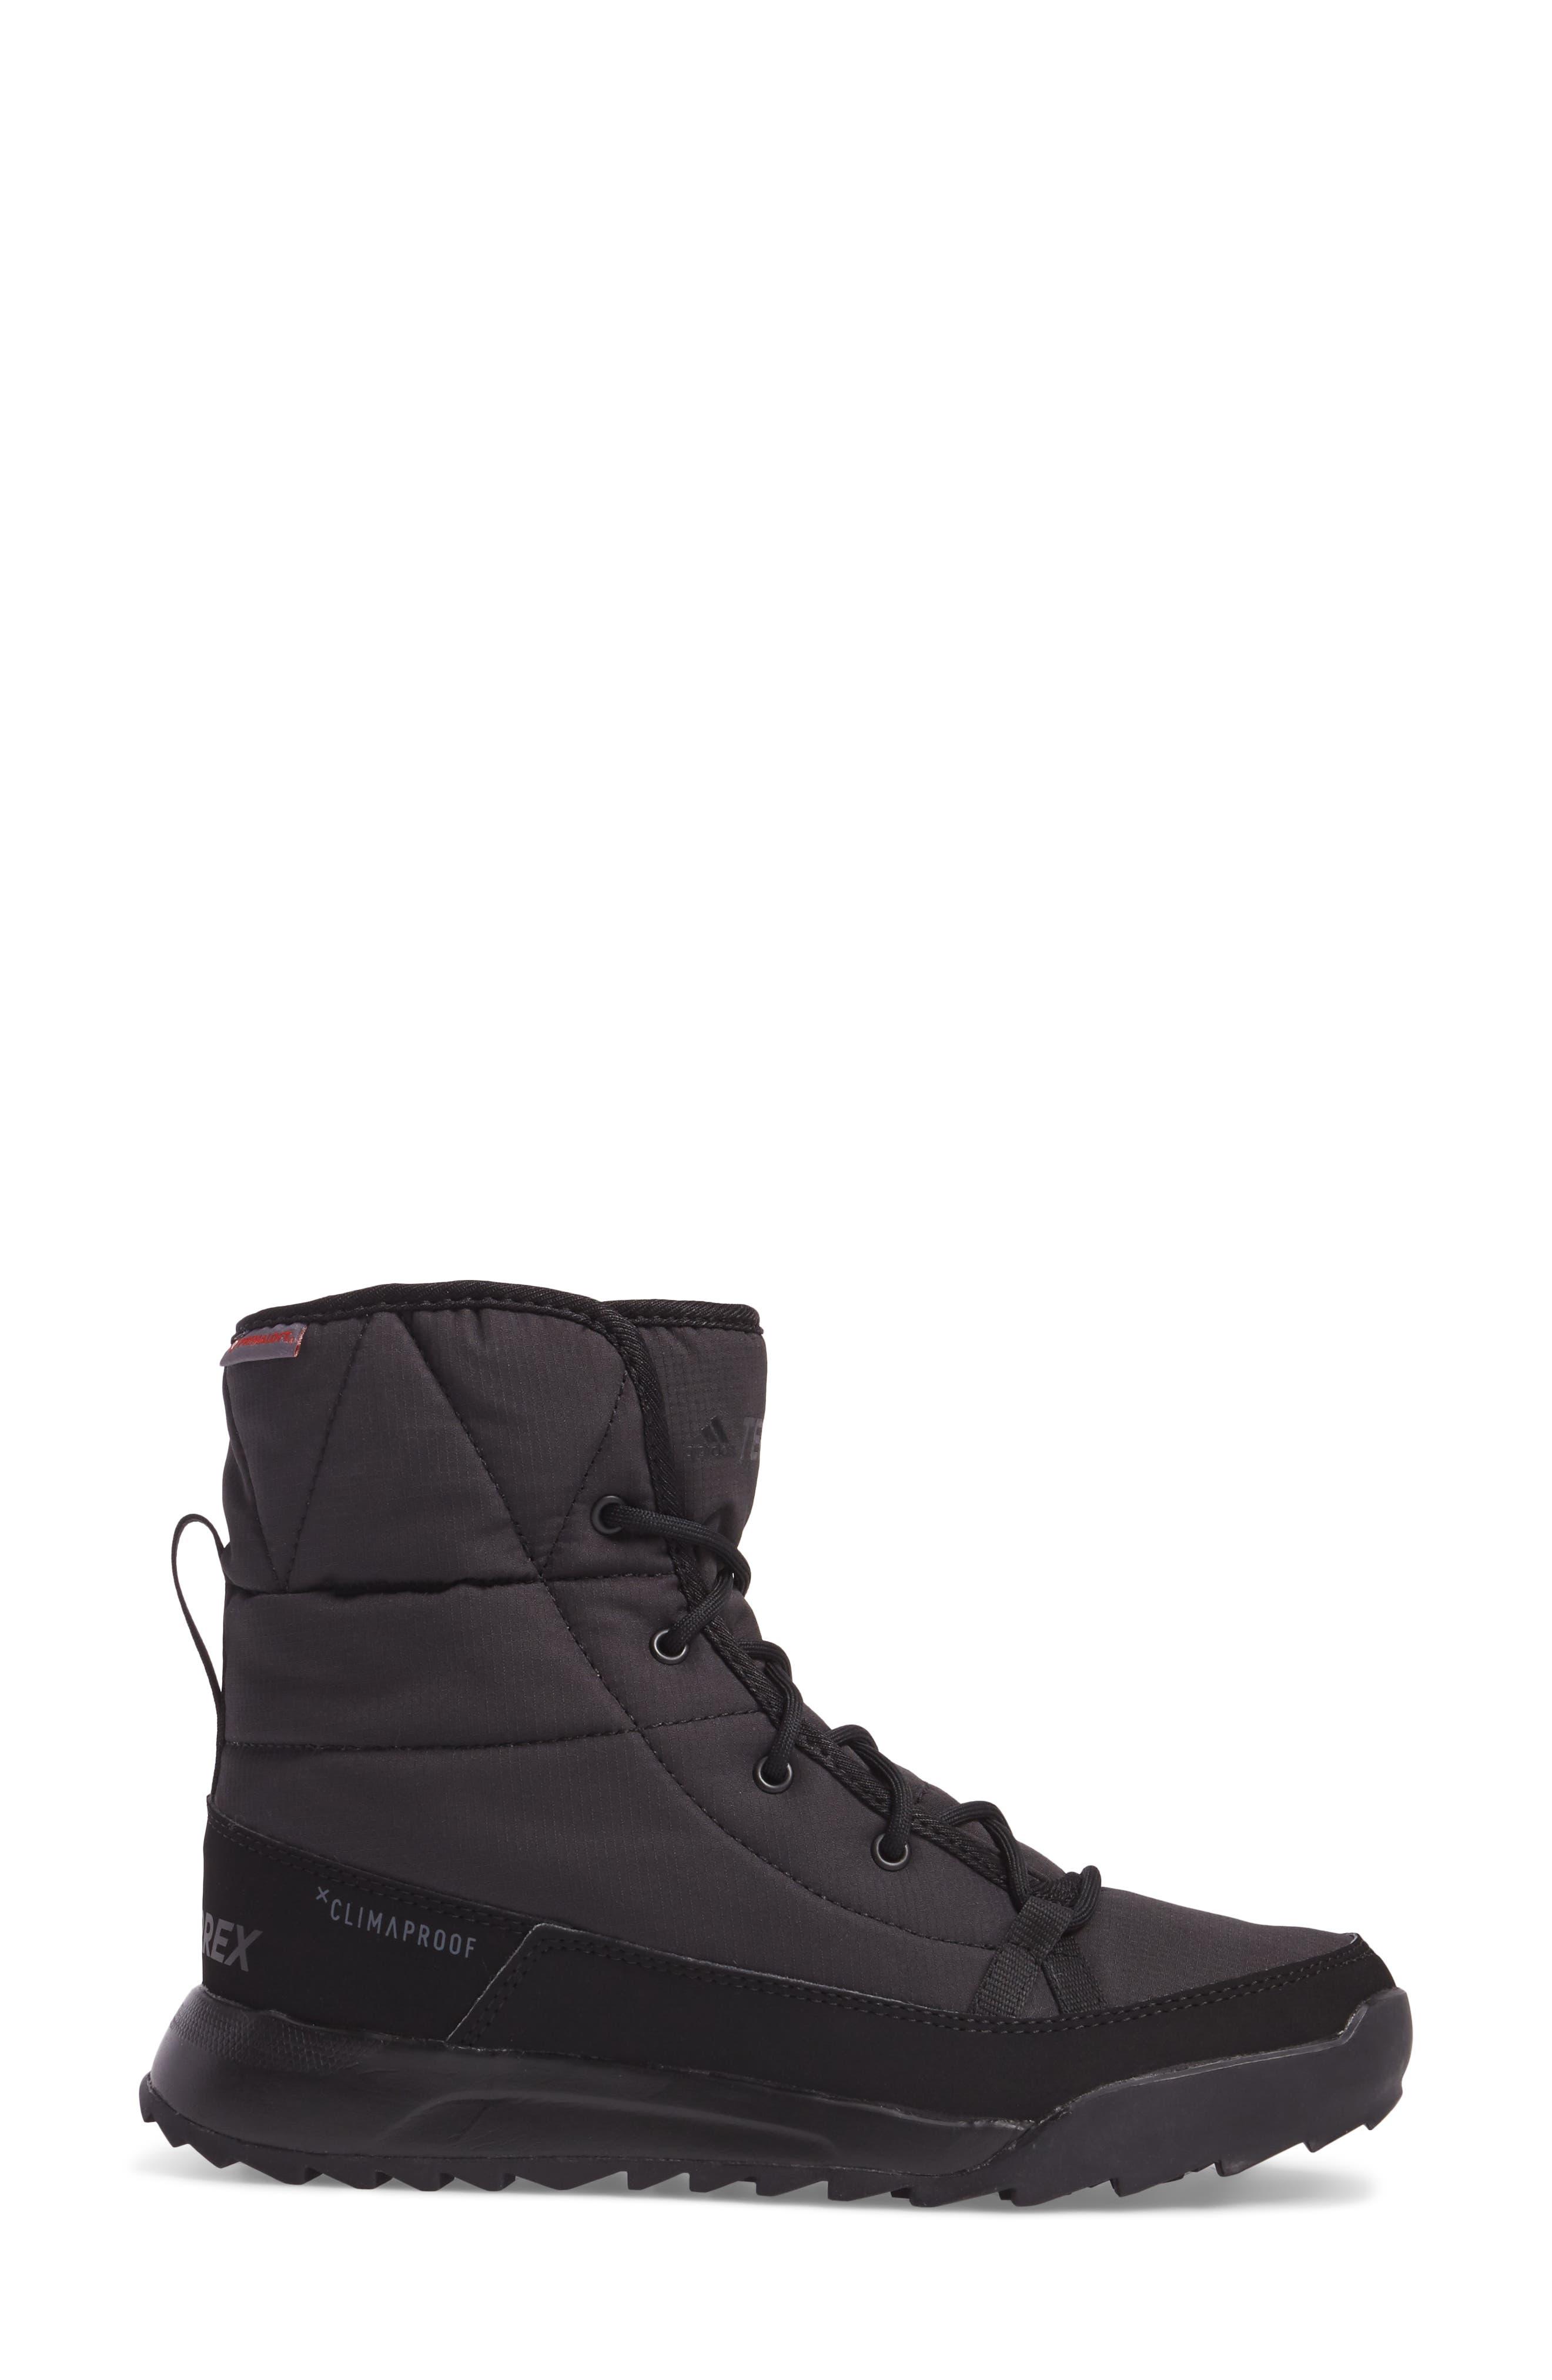 Terrex Choleah Waterproof Boot,                             Alternate thumbnail 3, color,                             001